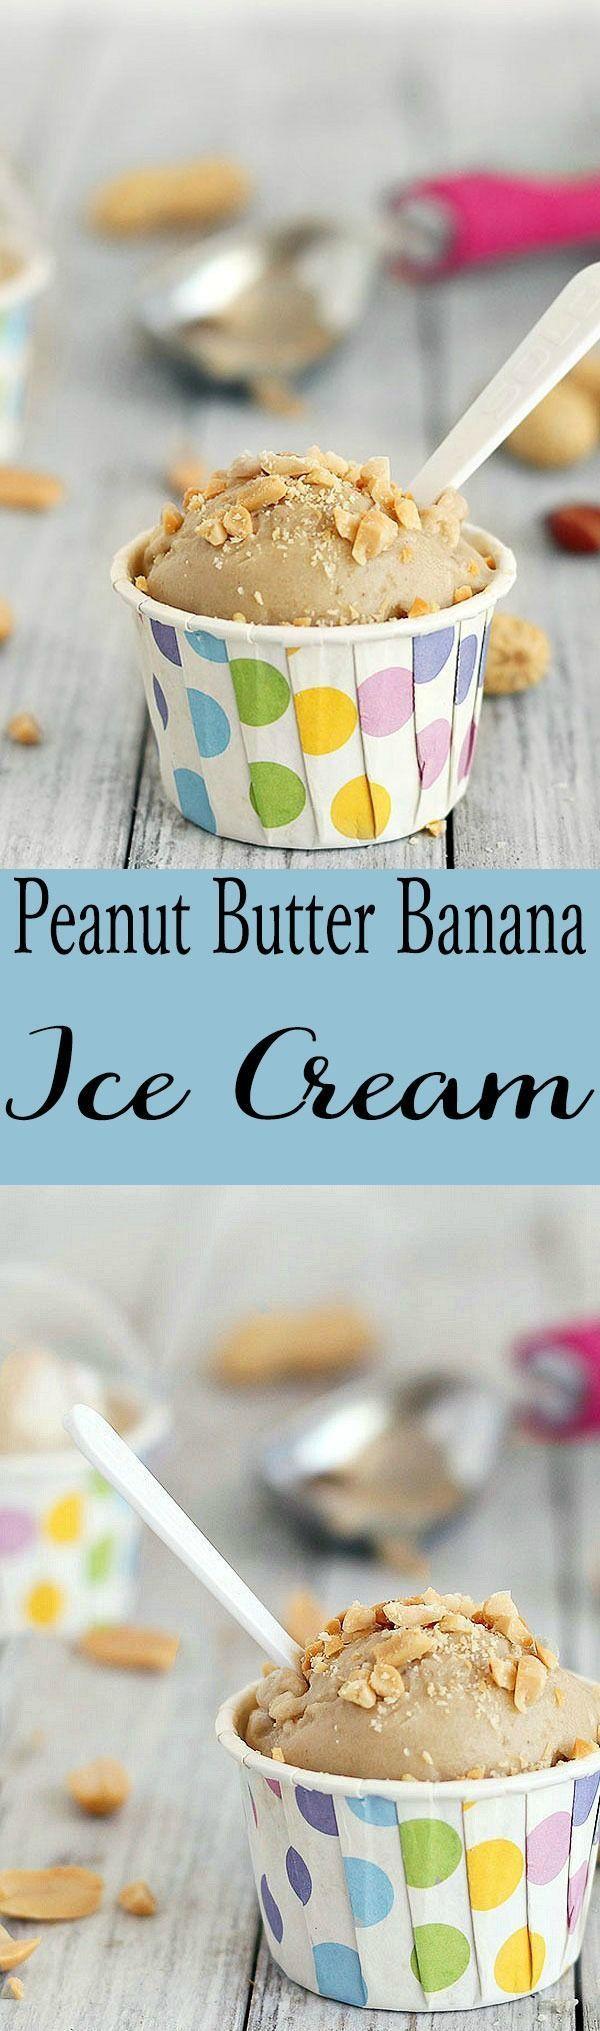 No dairy, Banana ice cream and Peanut butter banana on Pinterest